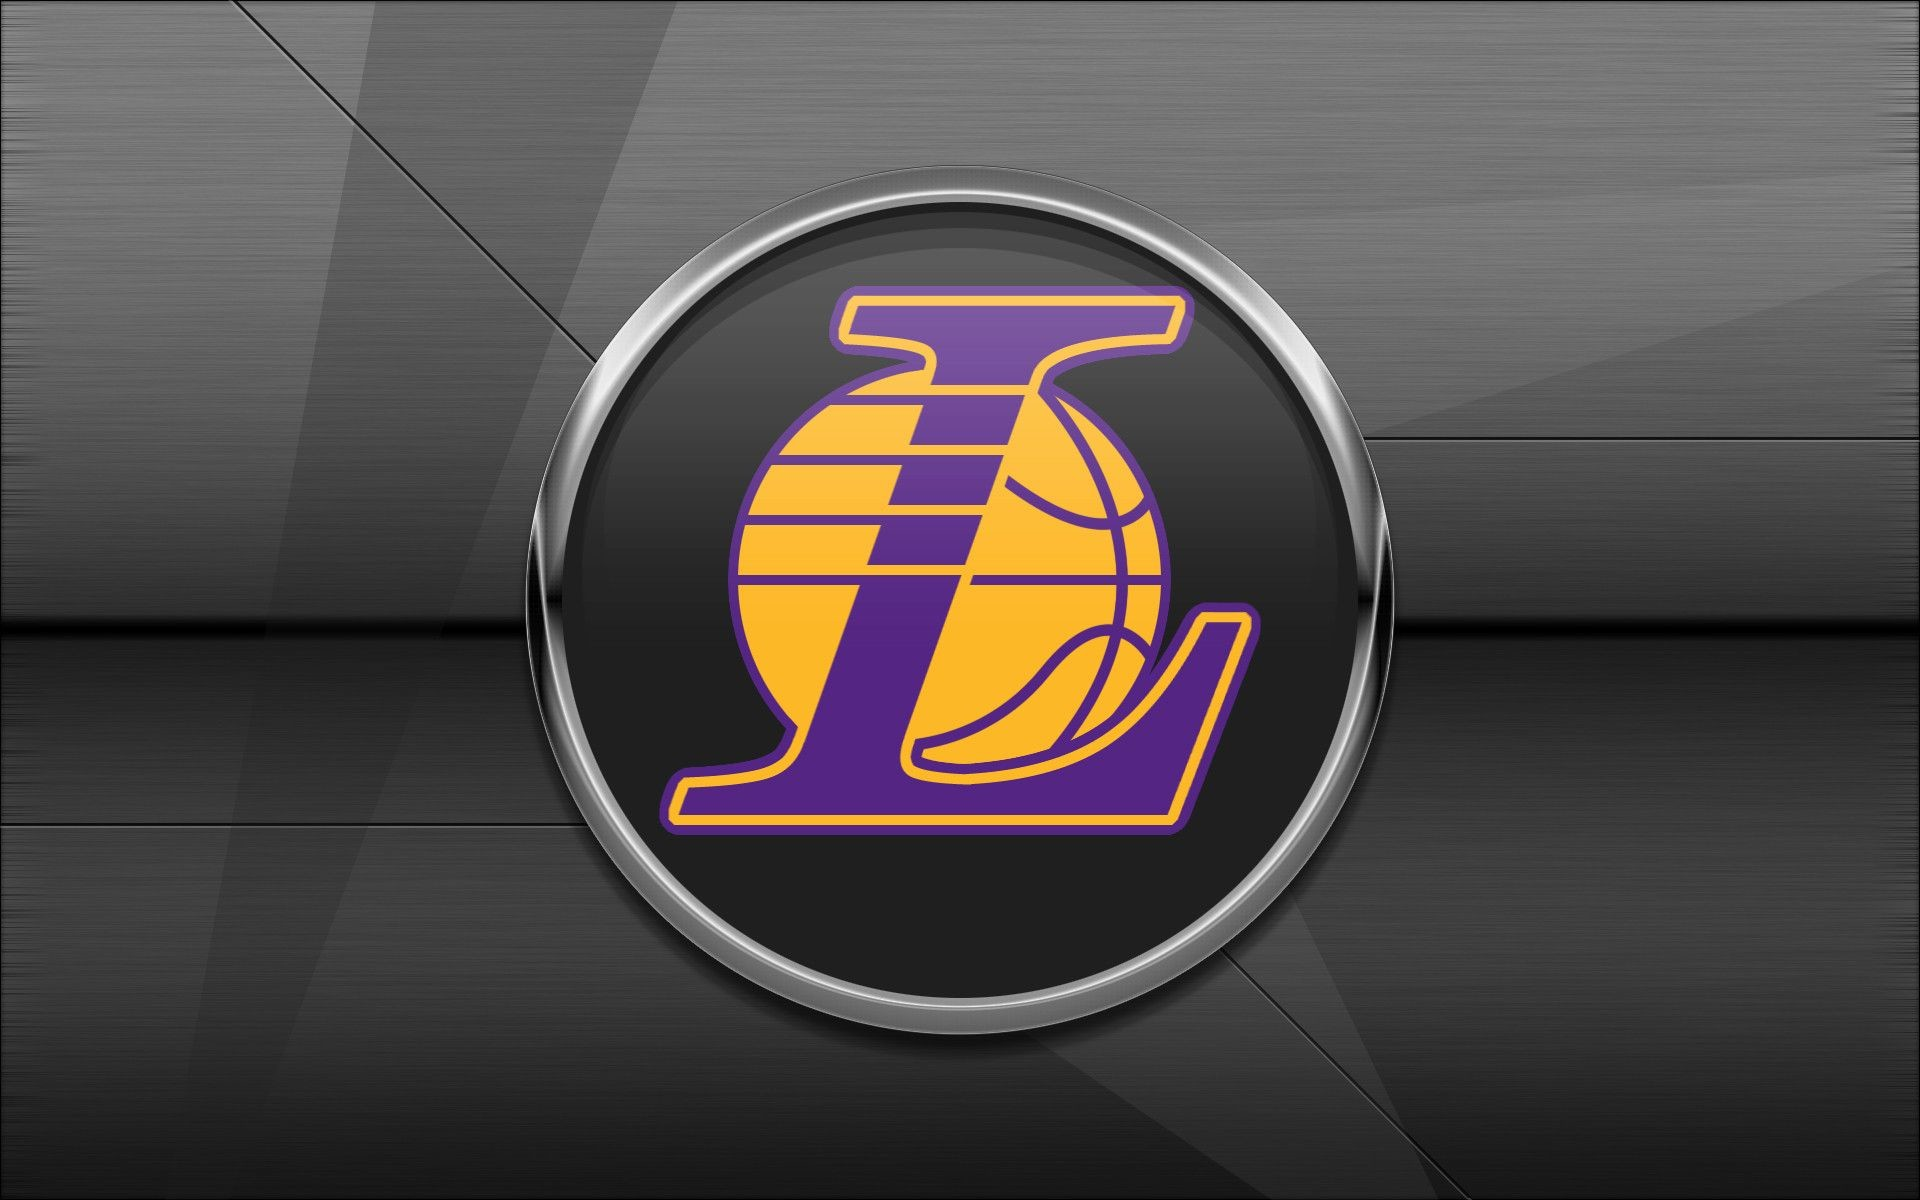 Lakers logo wallpapers HD.